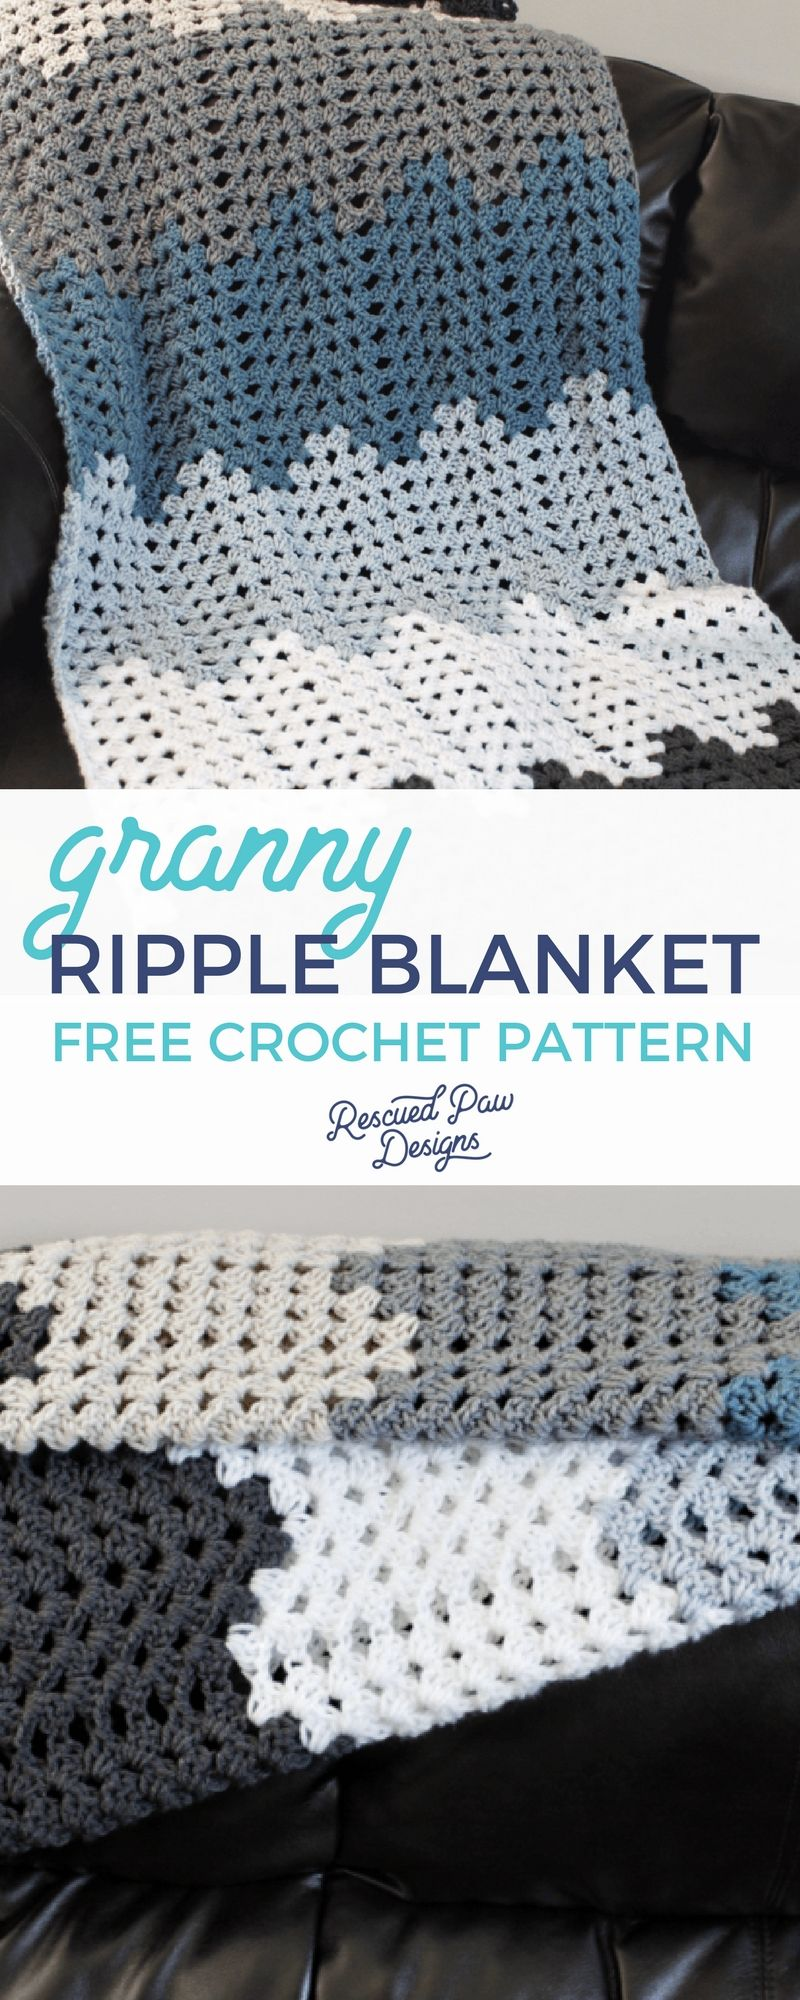 Crochet Blanket Pattern - Rescued Paw Designs Co. | Manta, Tejido y ...